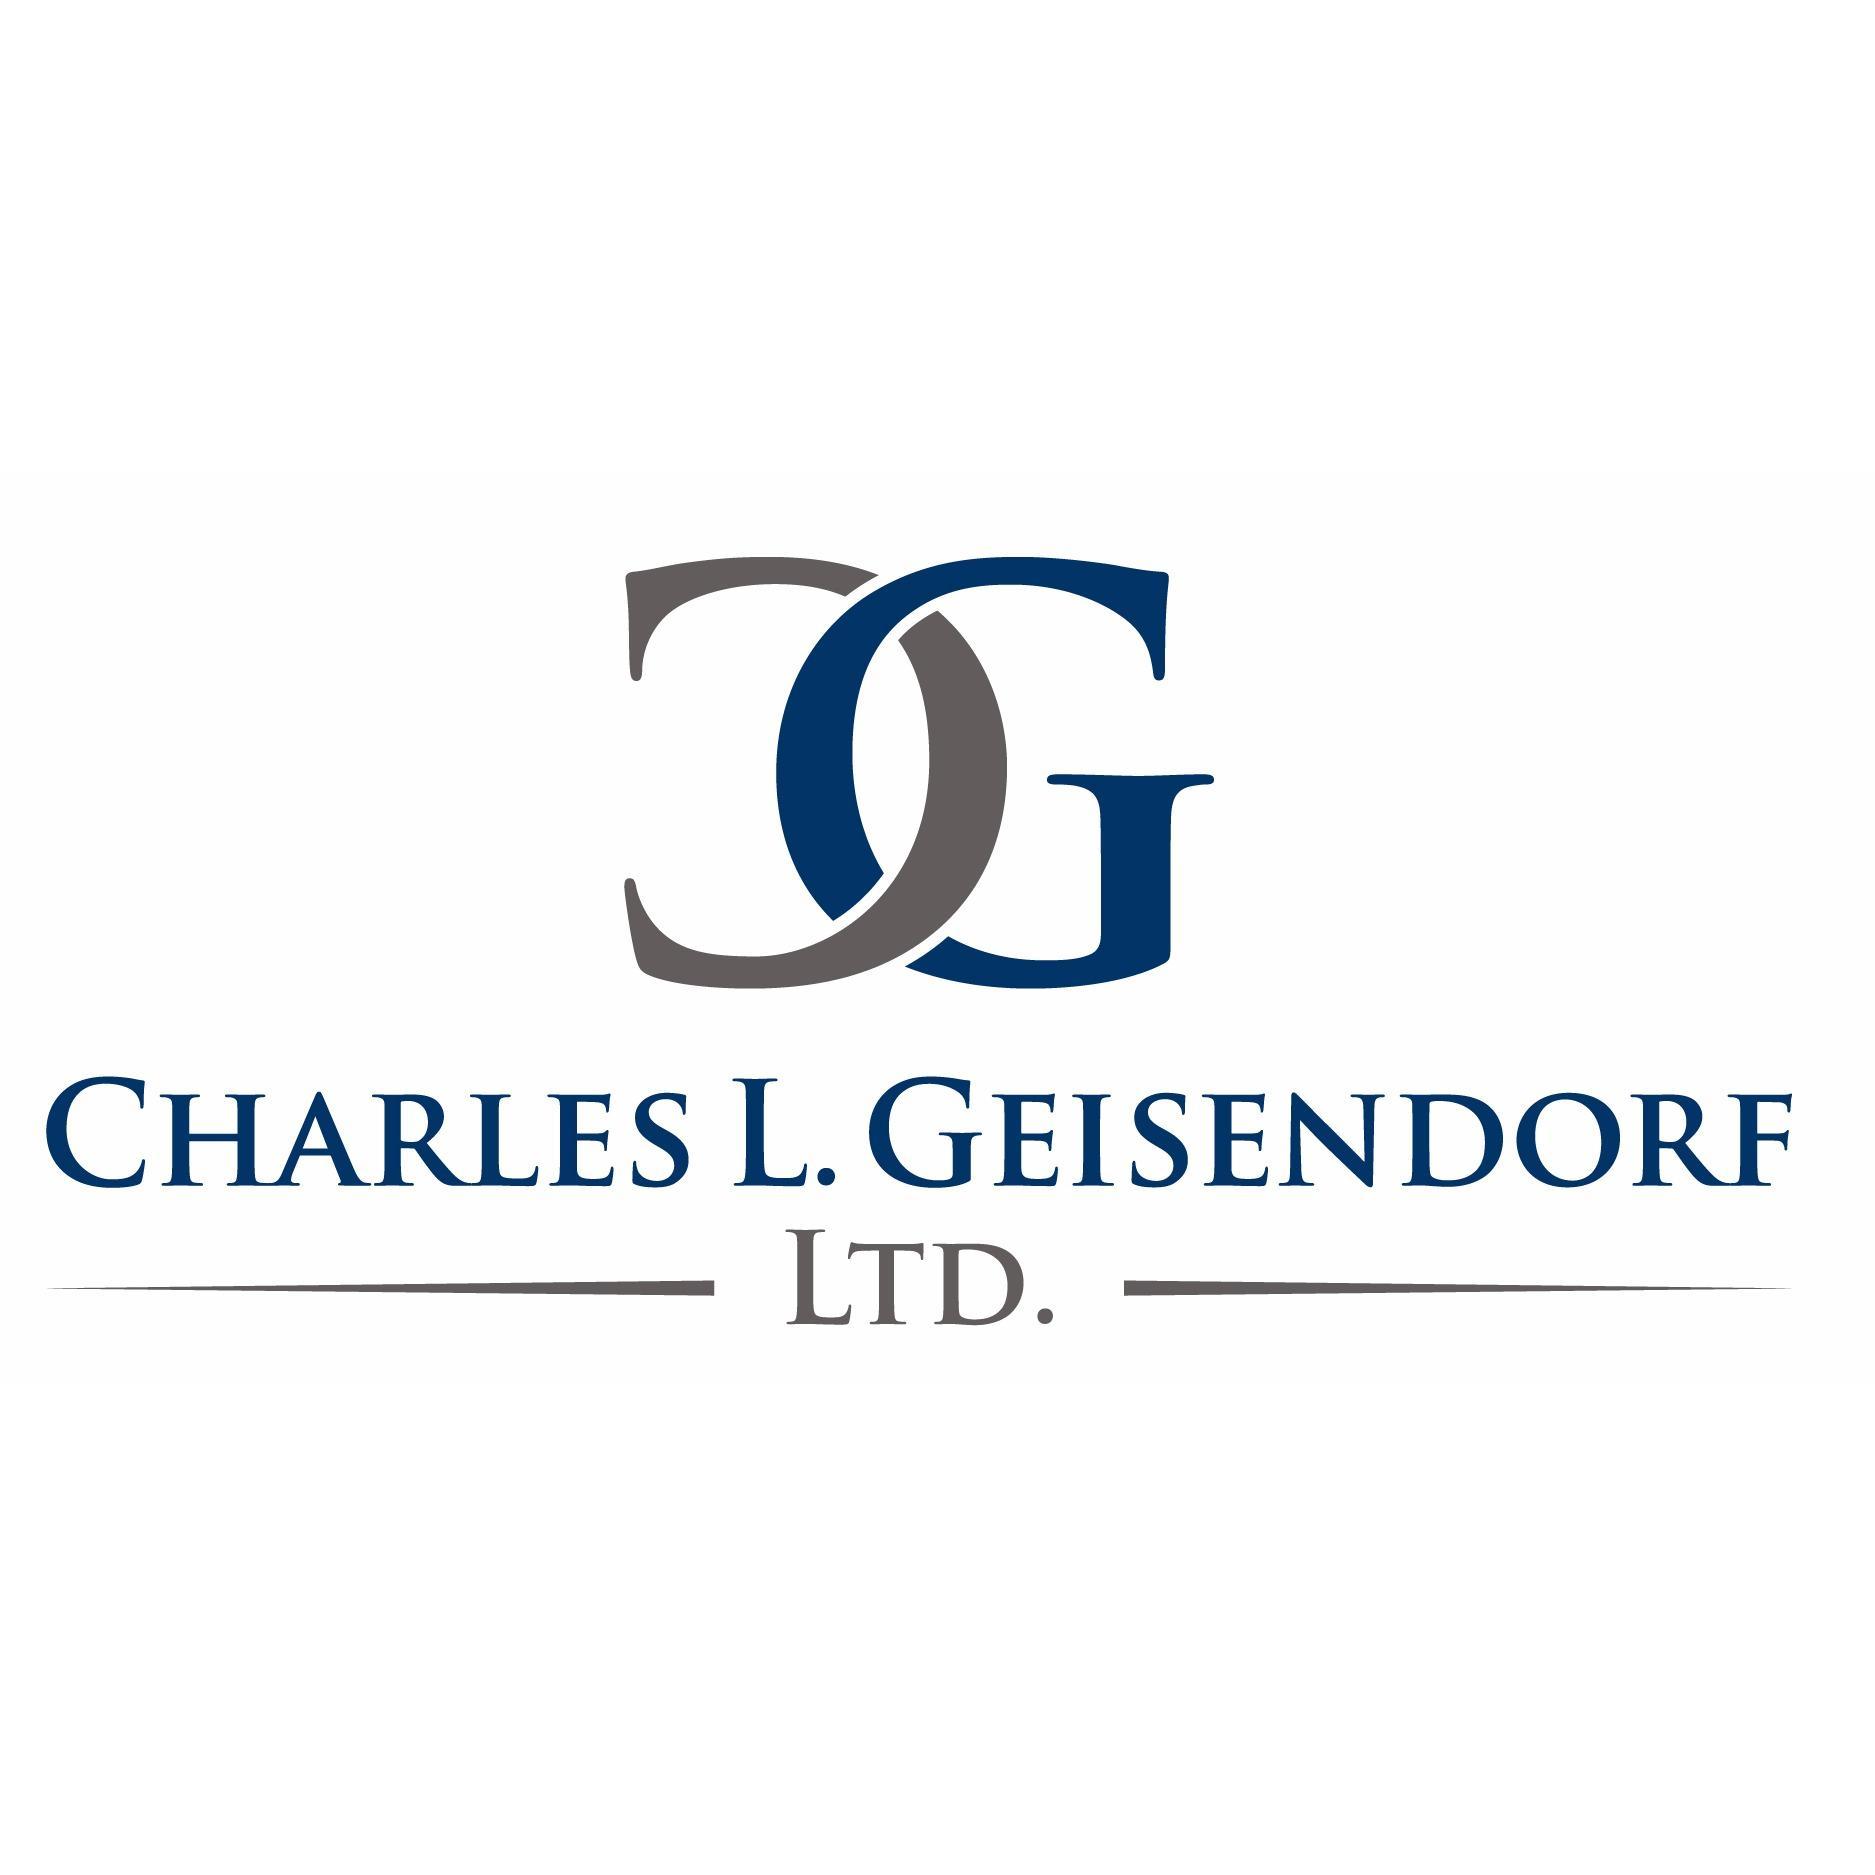 Charles L. Geisendorf, Ltd.